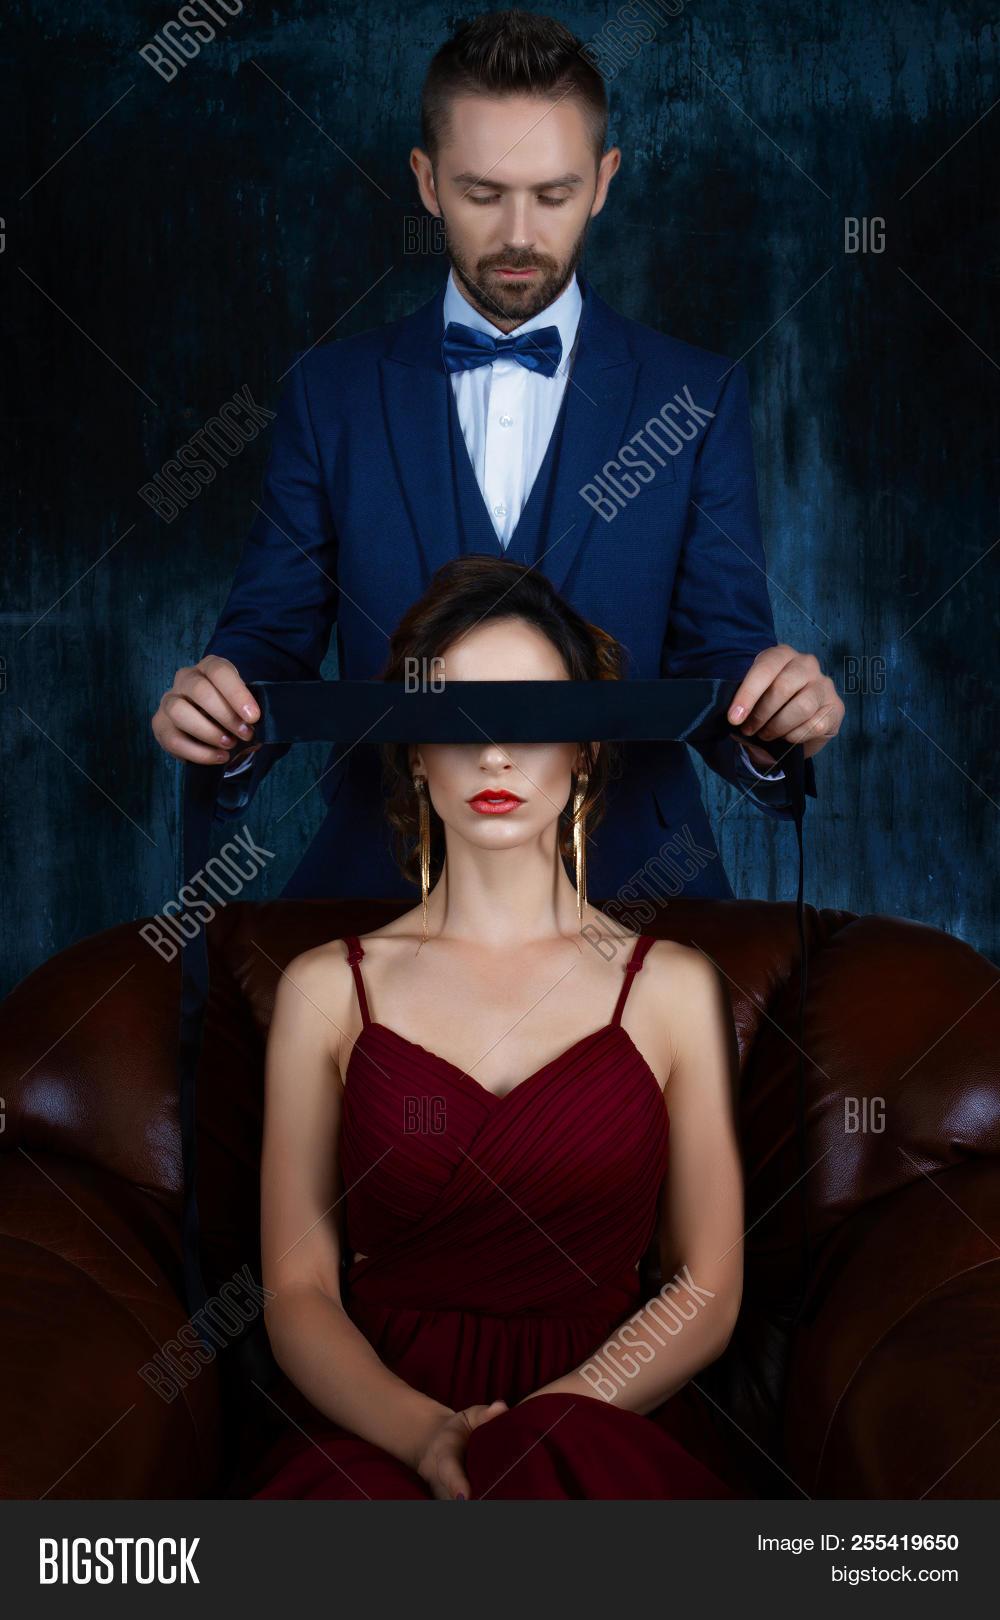 free marital dating